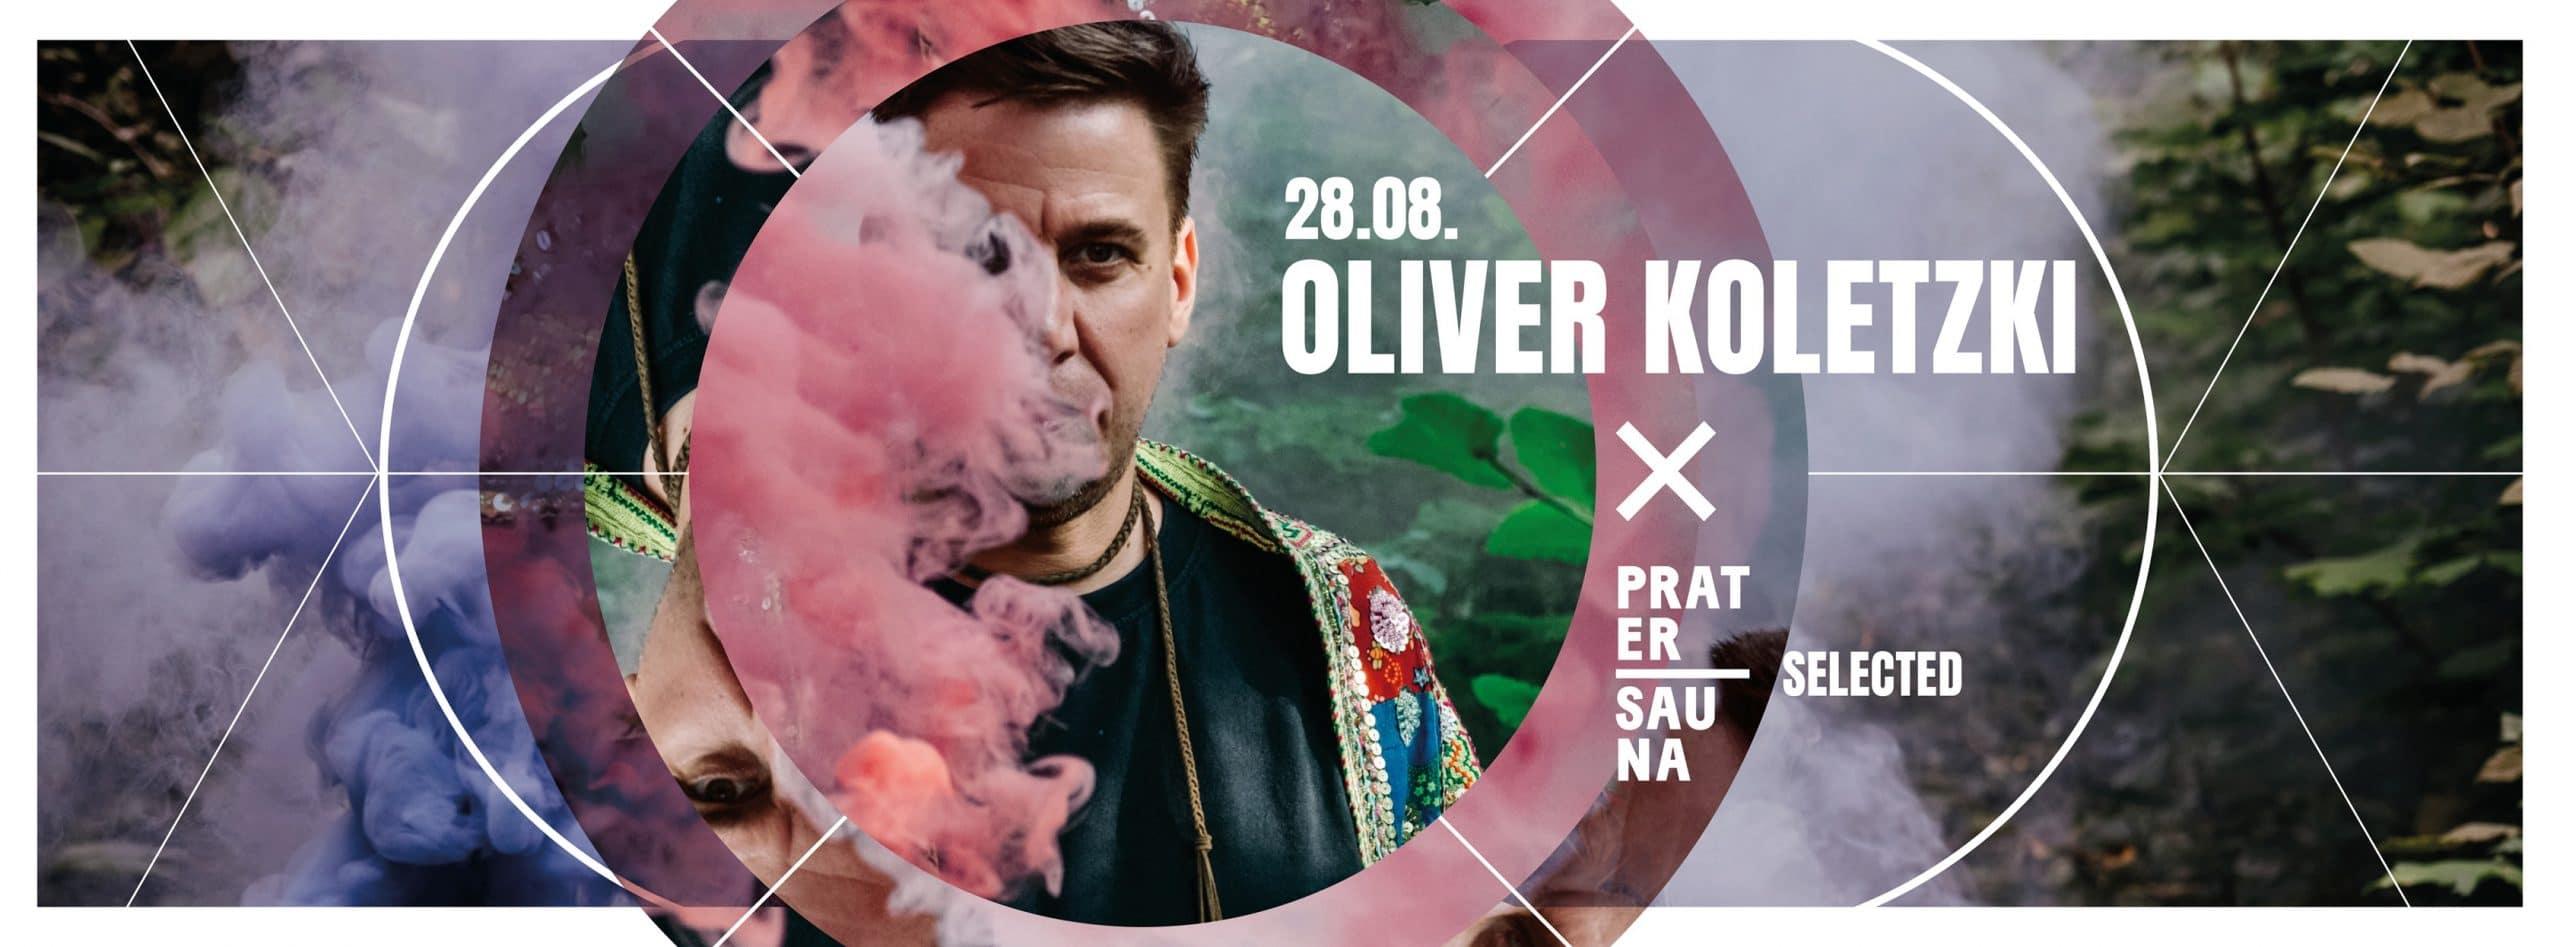 Events Wien: Oliver Koletzki x Pratersauna